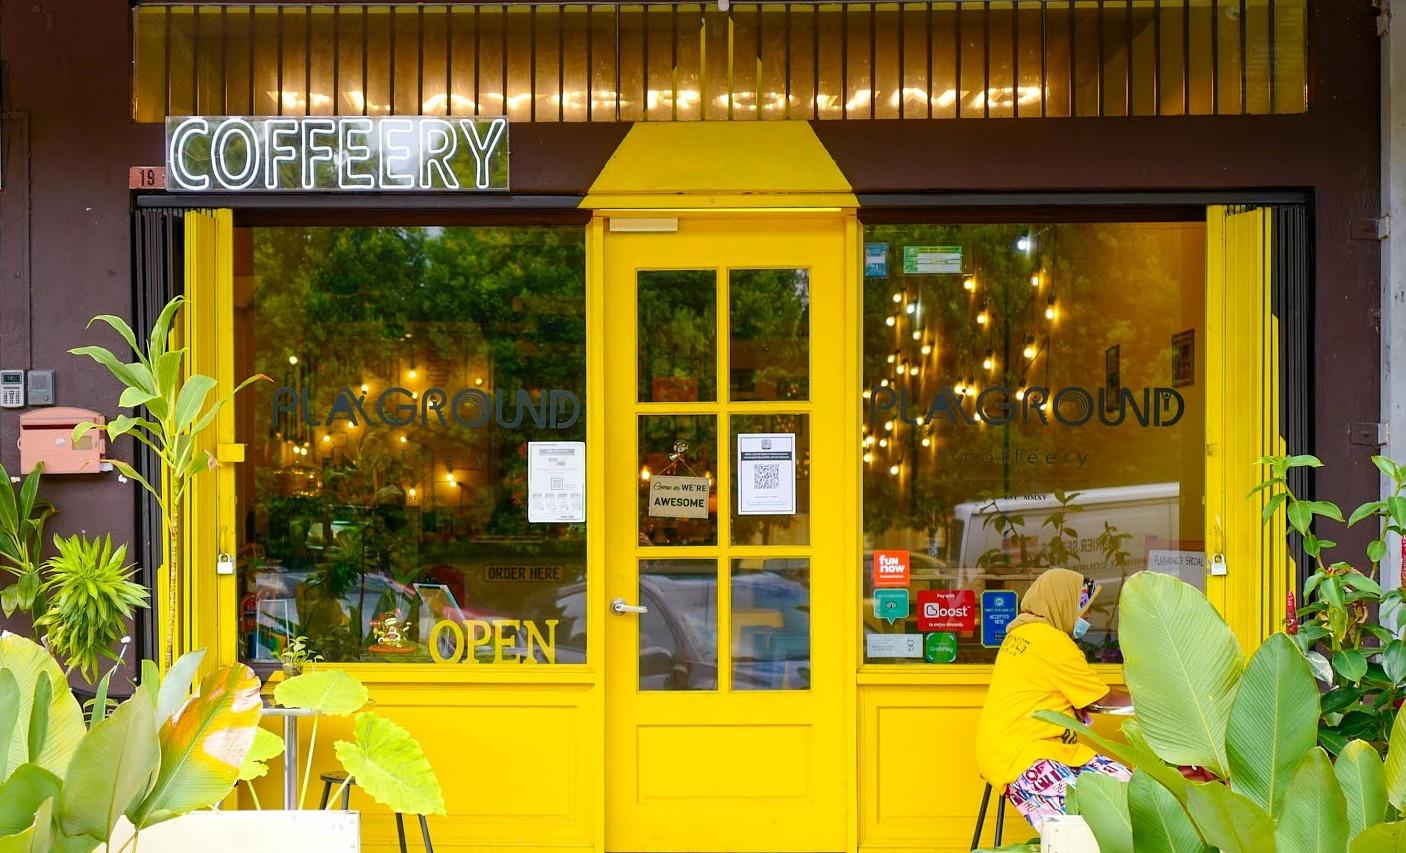 Playground Coffeery, Taman Melawati